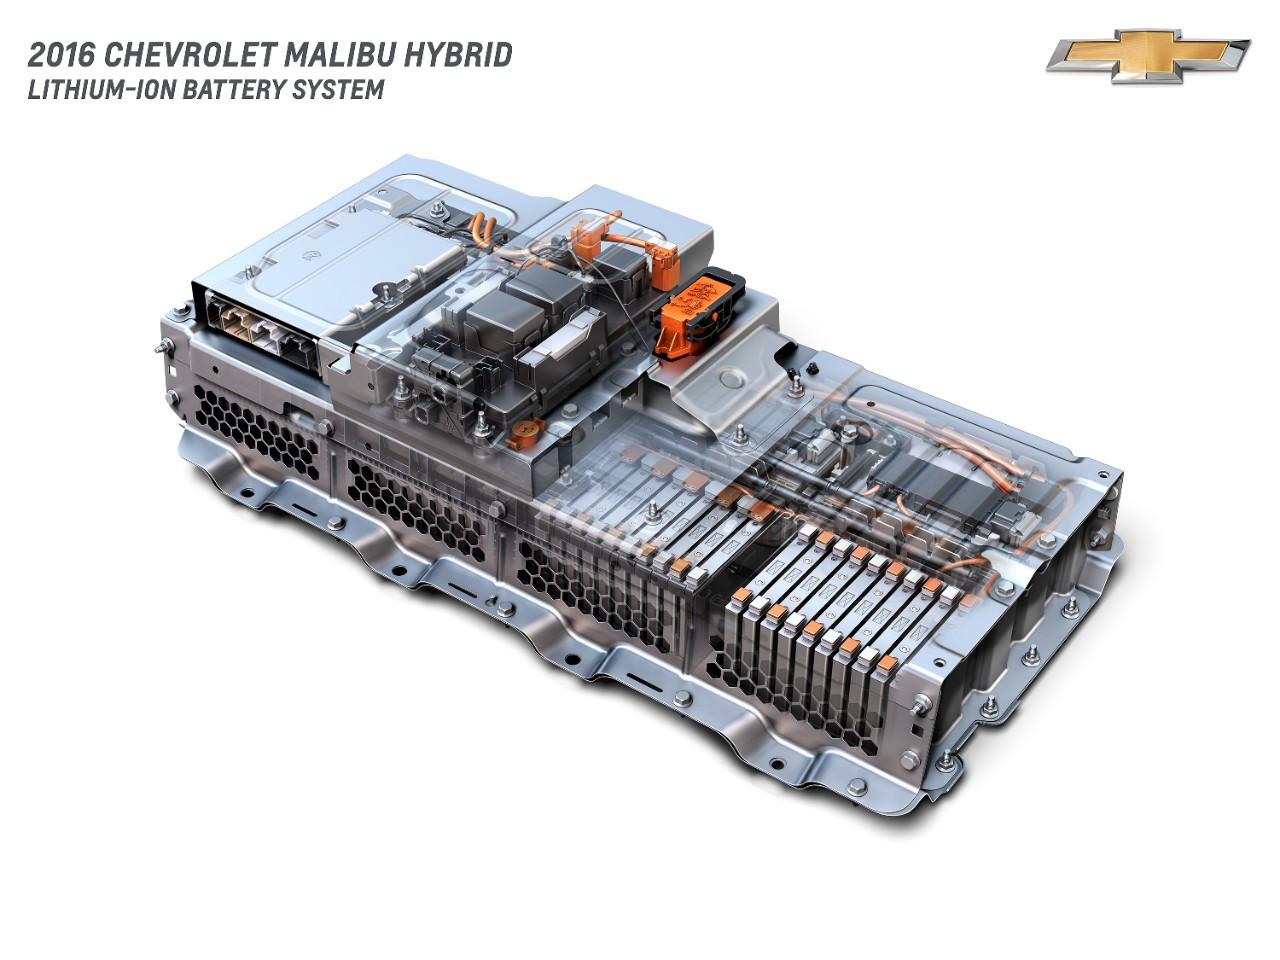 Batterie de la Chevrolet Malibu Hybride 2016